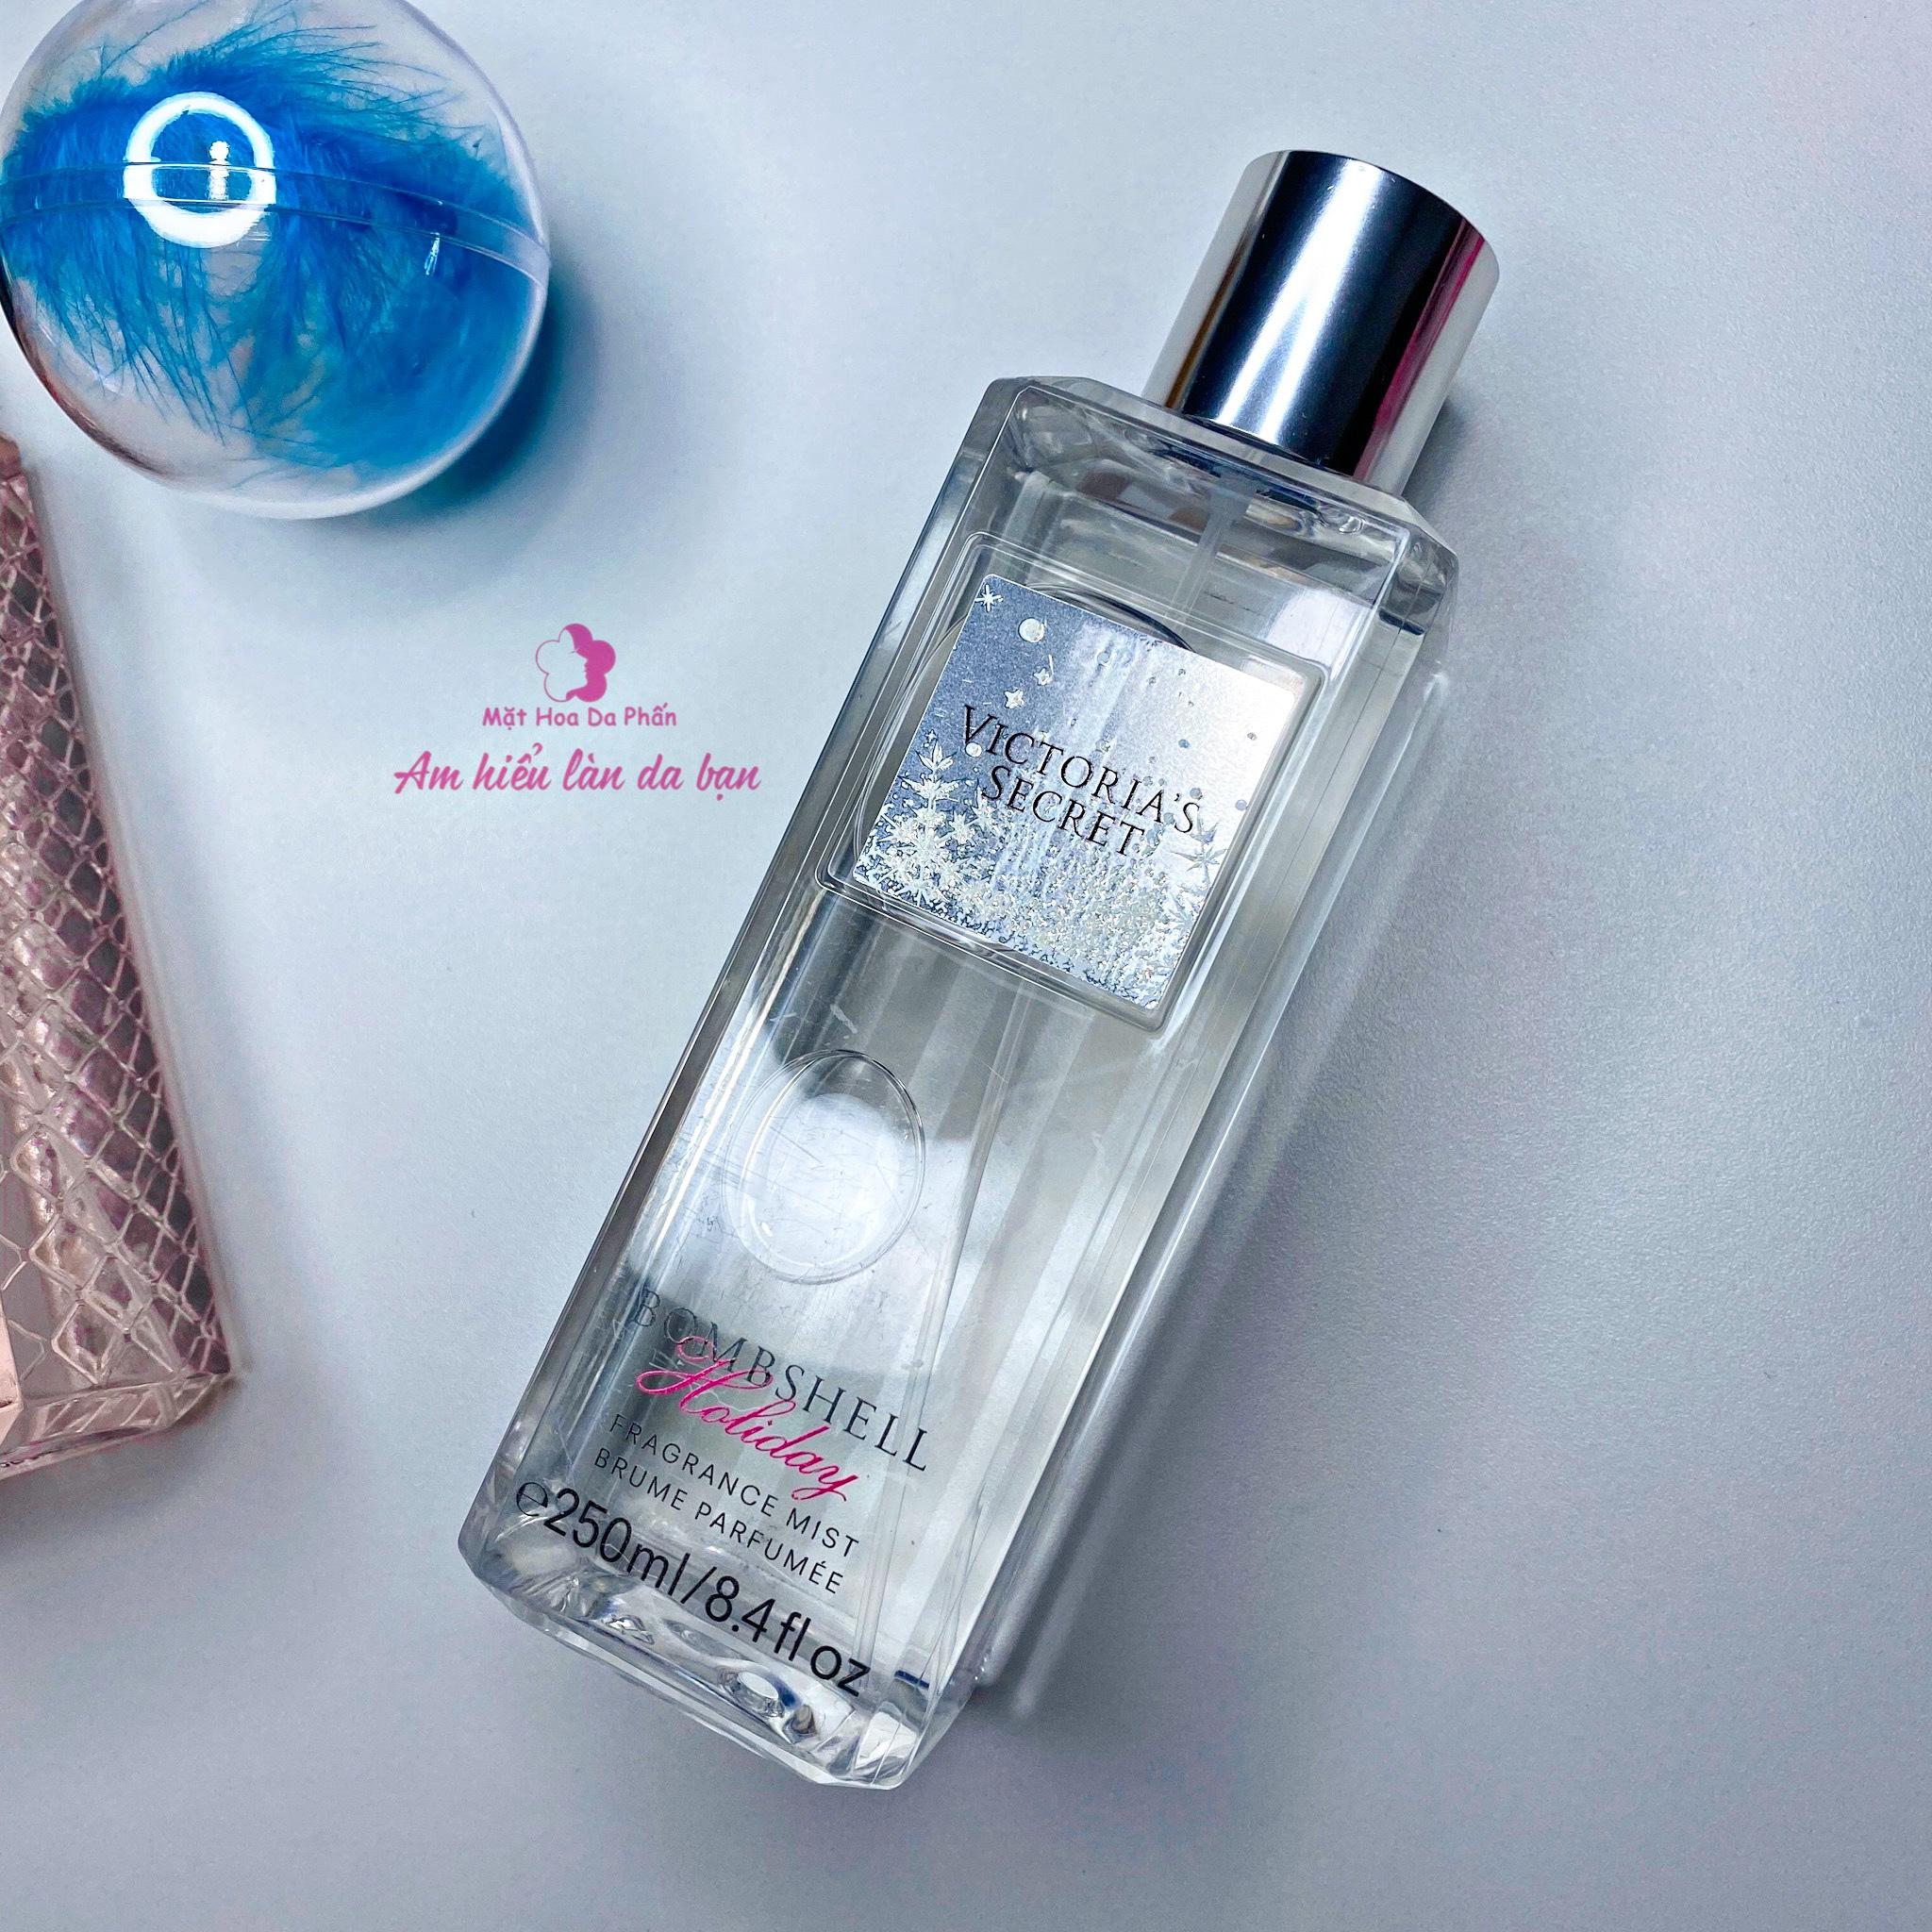 Xịt Body Victoria's Secret 250ML (mẫu vuông)